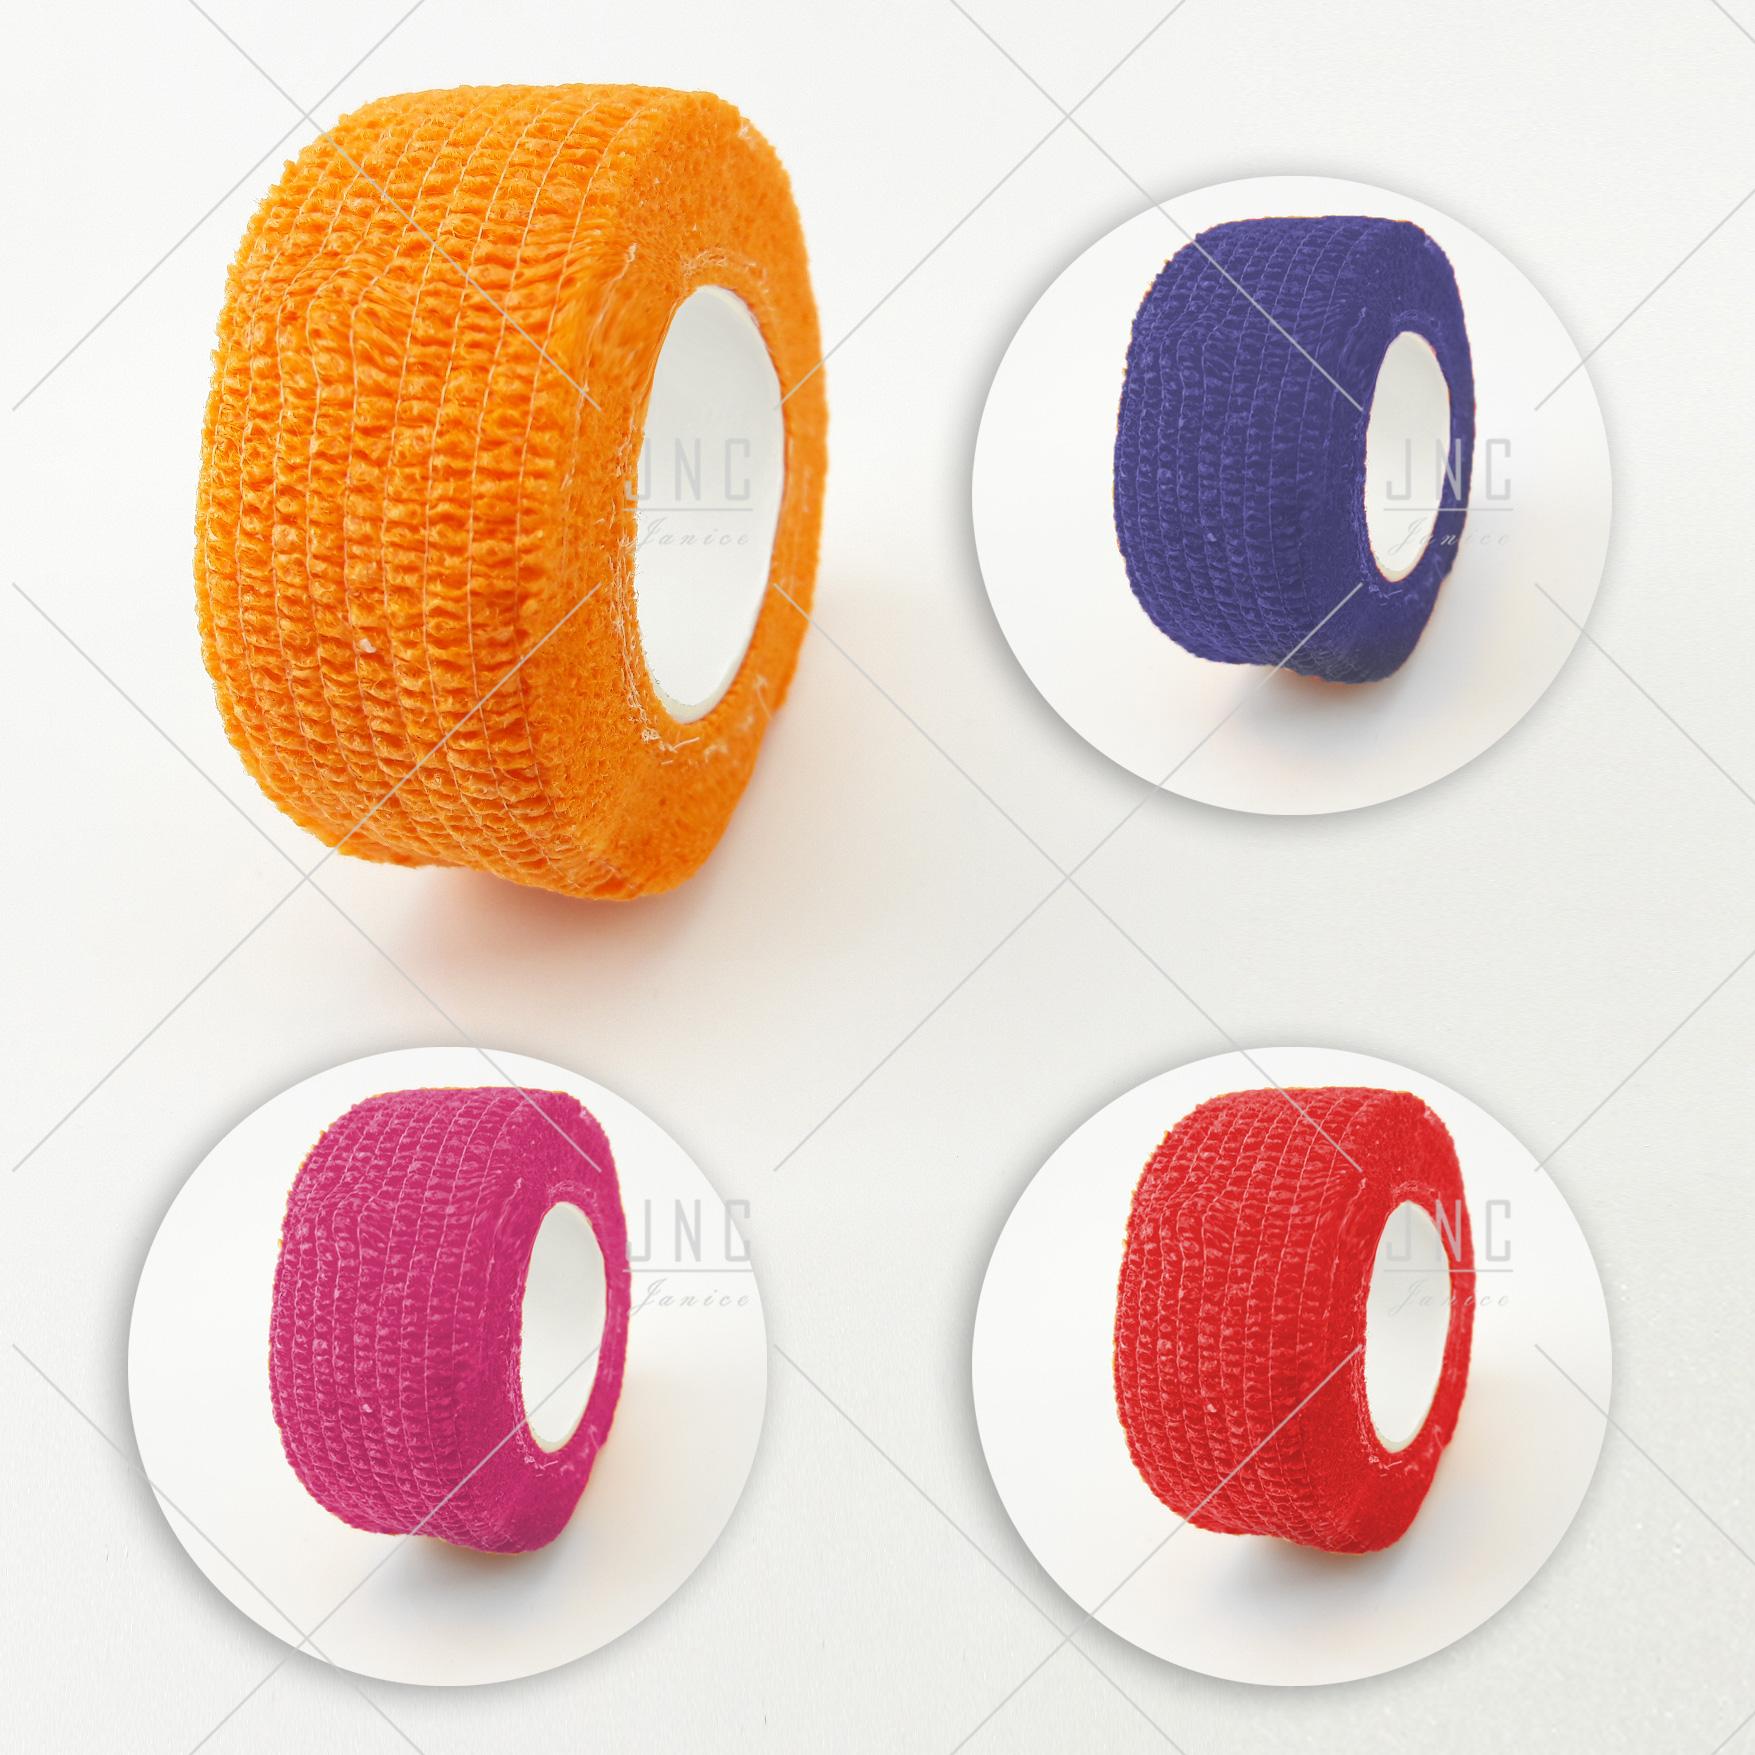 Rolo ligadura Protector de dedos Ref.861533